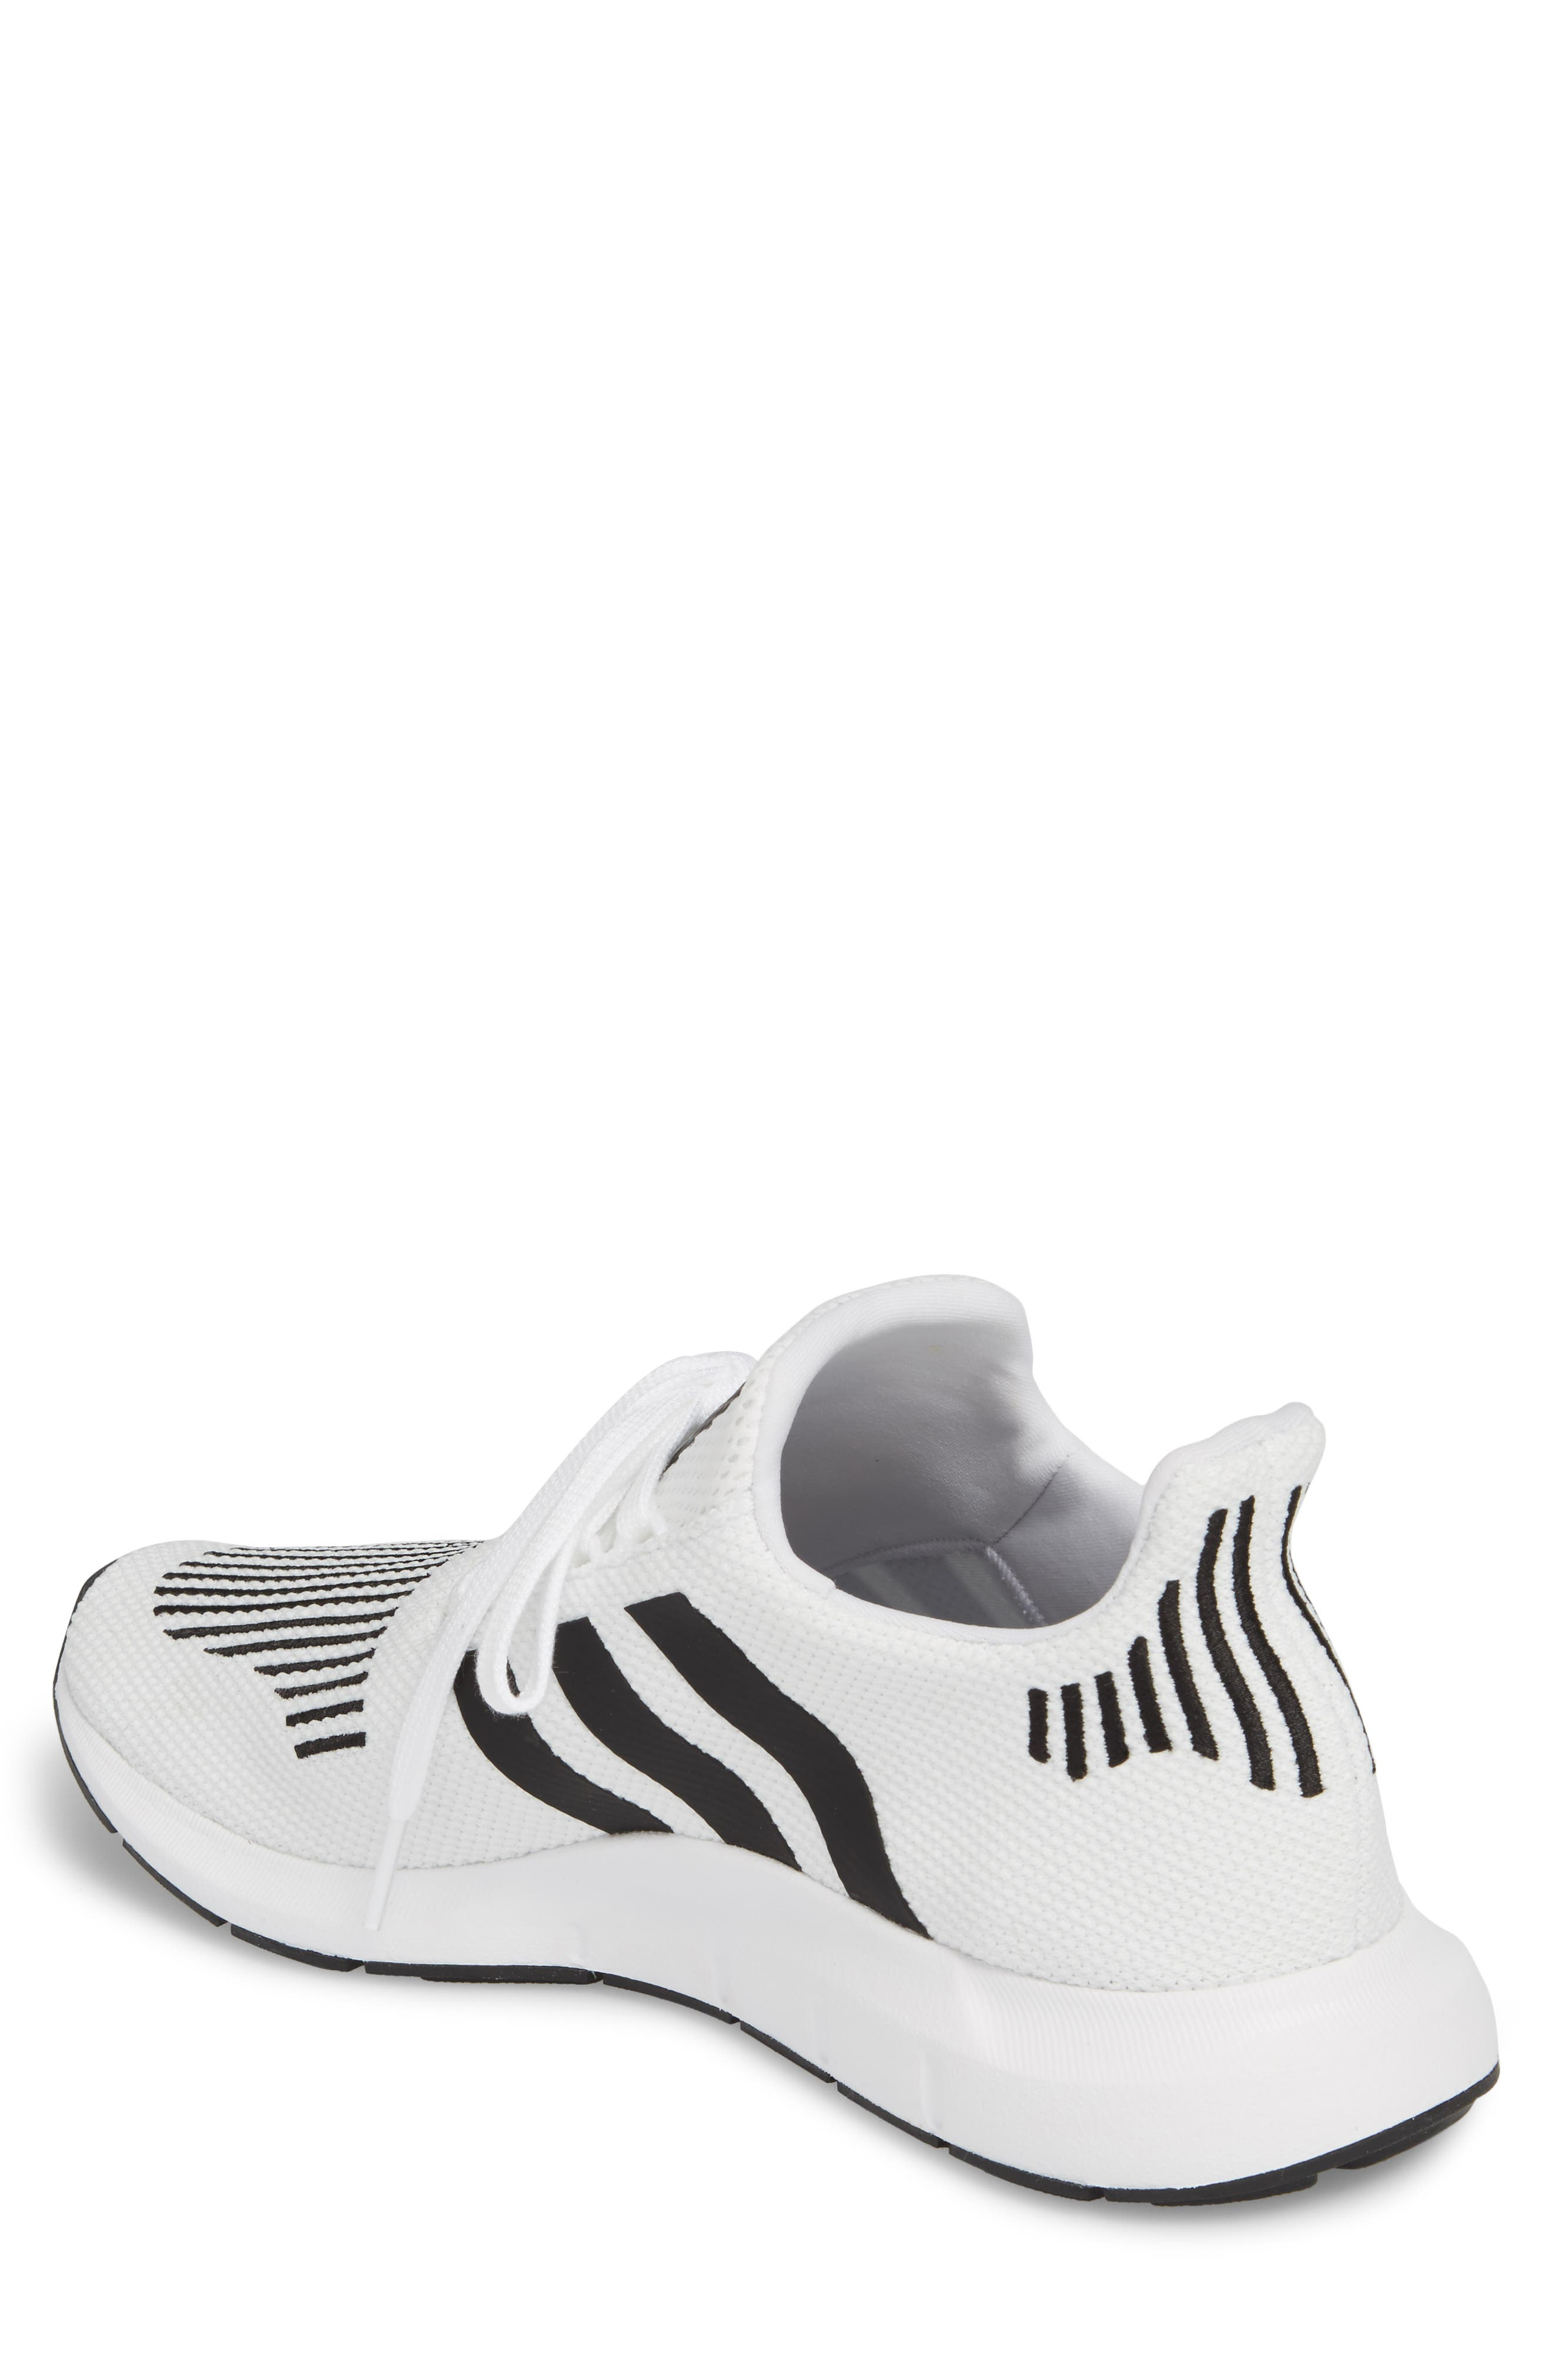 Swift Run Sneaker,                             Alternate thumbnail 2, color,                             White/ Core Black/ Grey